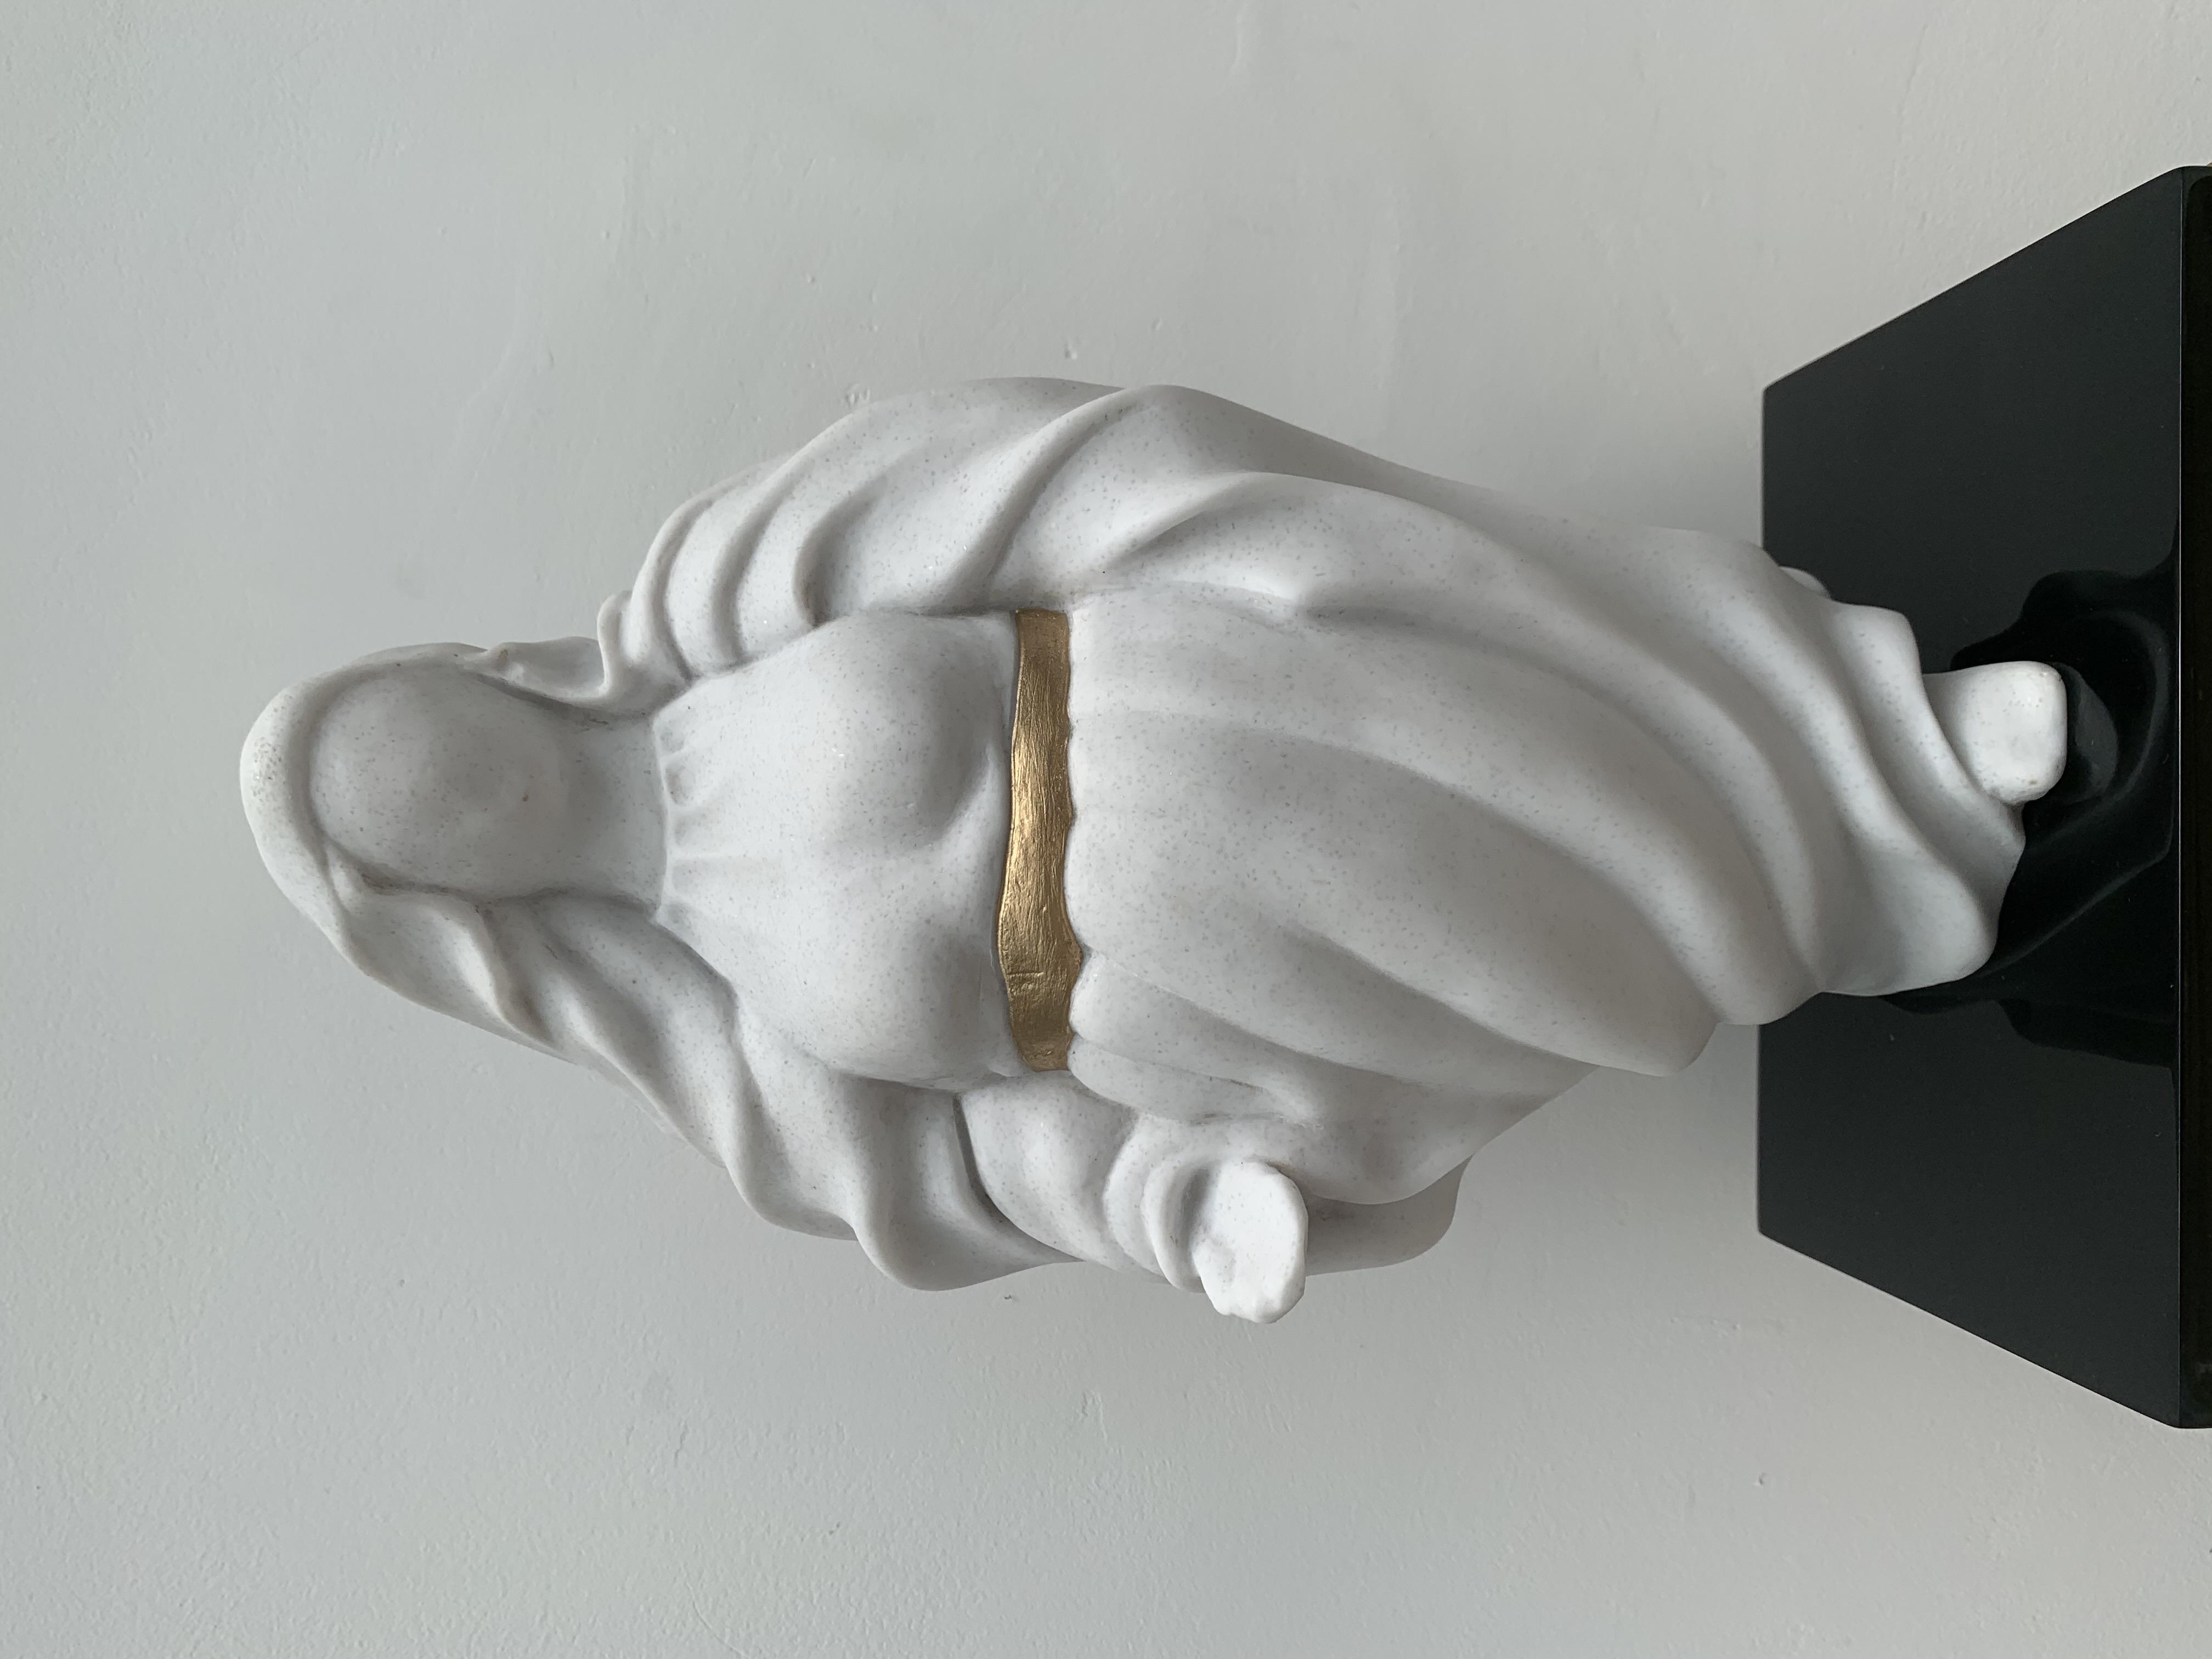 MARCELO NECES - NOSSA SENHORA - 35 X 19